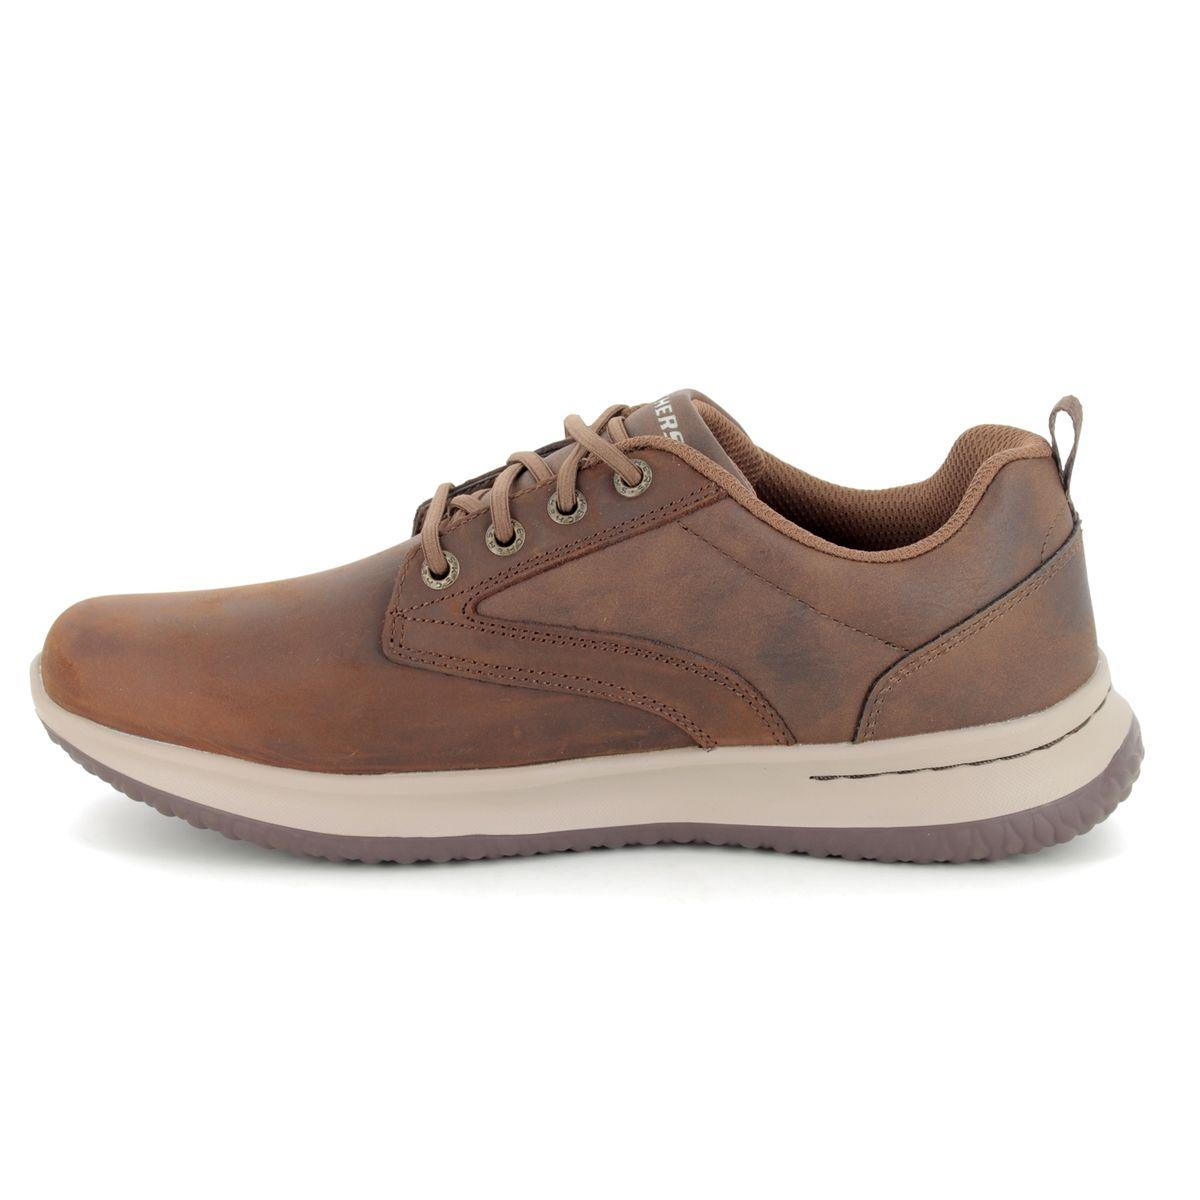 Skechers Relaxed Fit: Selmen Revano (66276 Brown